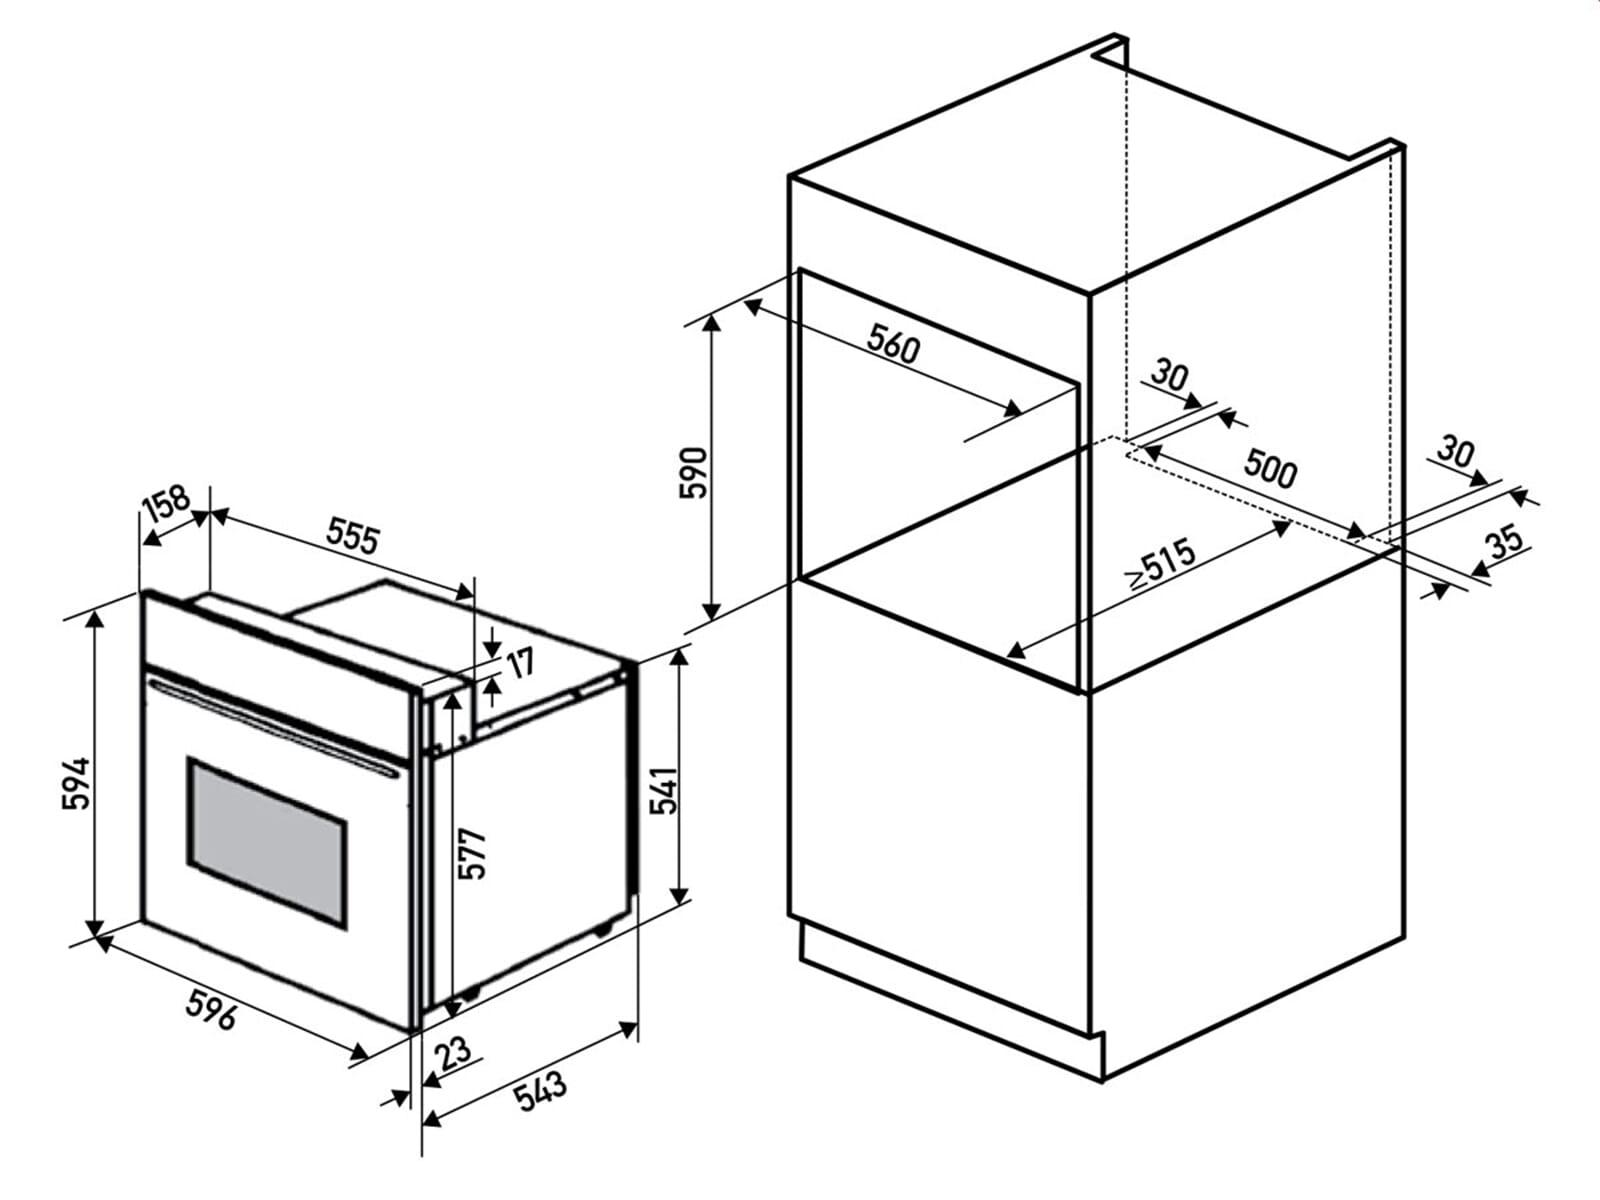 Oranier Clever-Set 11 Backofen EBS 9936 10 + Kochfeldabzug KXI 1092 70